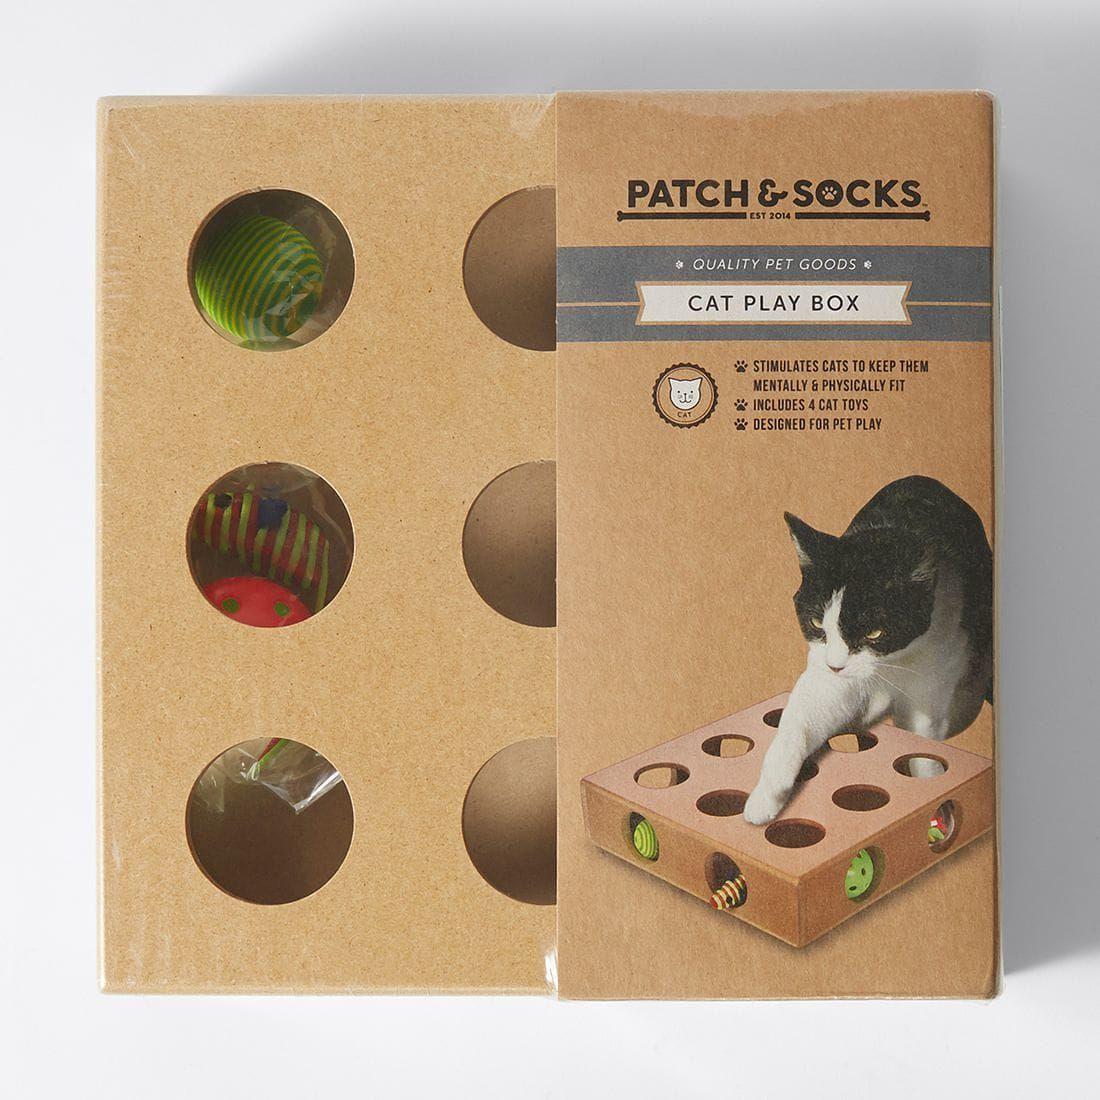 Patch Socks Cat Play Box Cat Playing Cat Socks Cat Toys